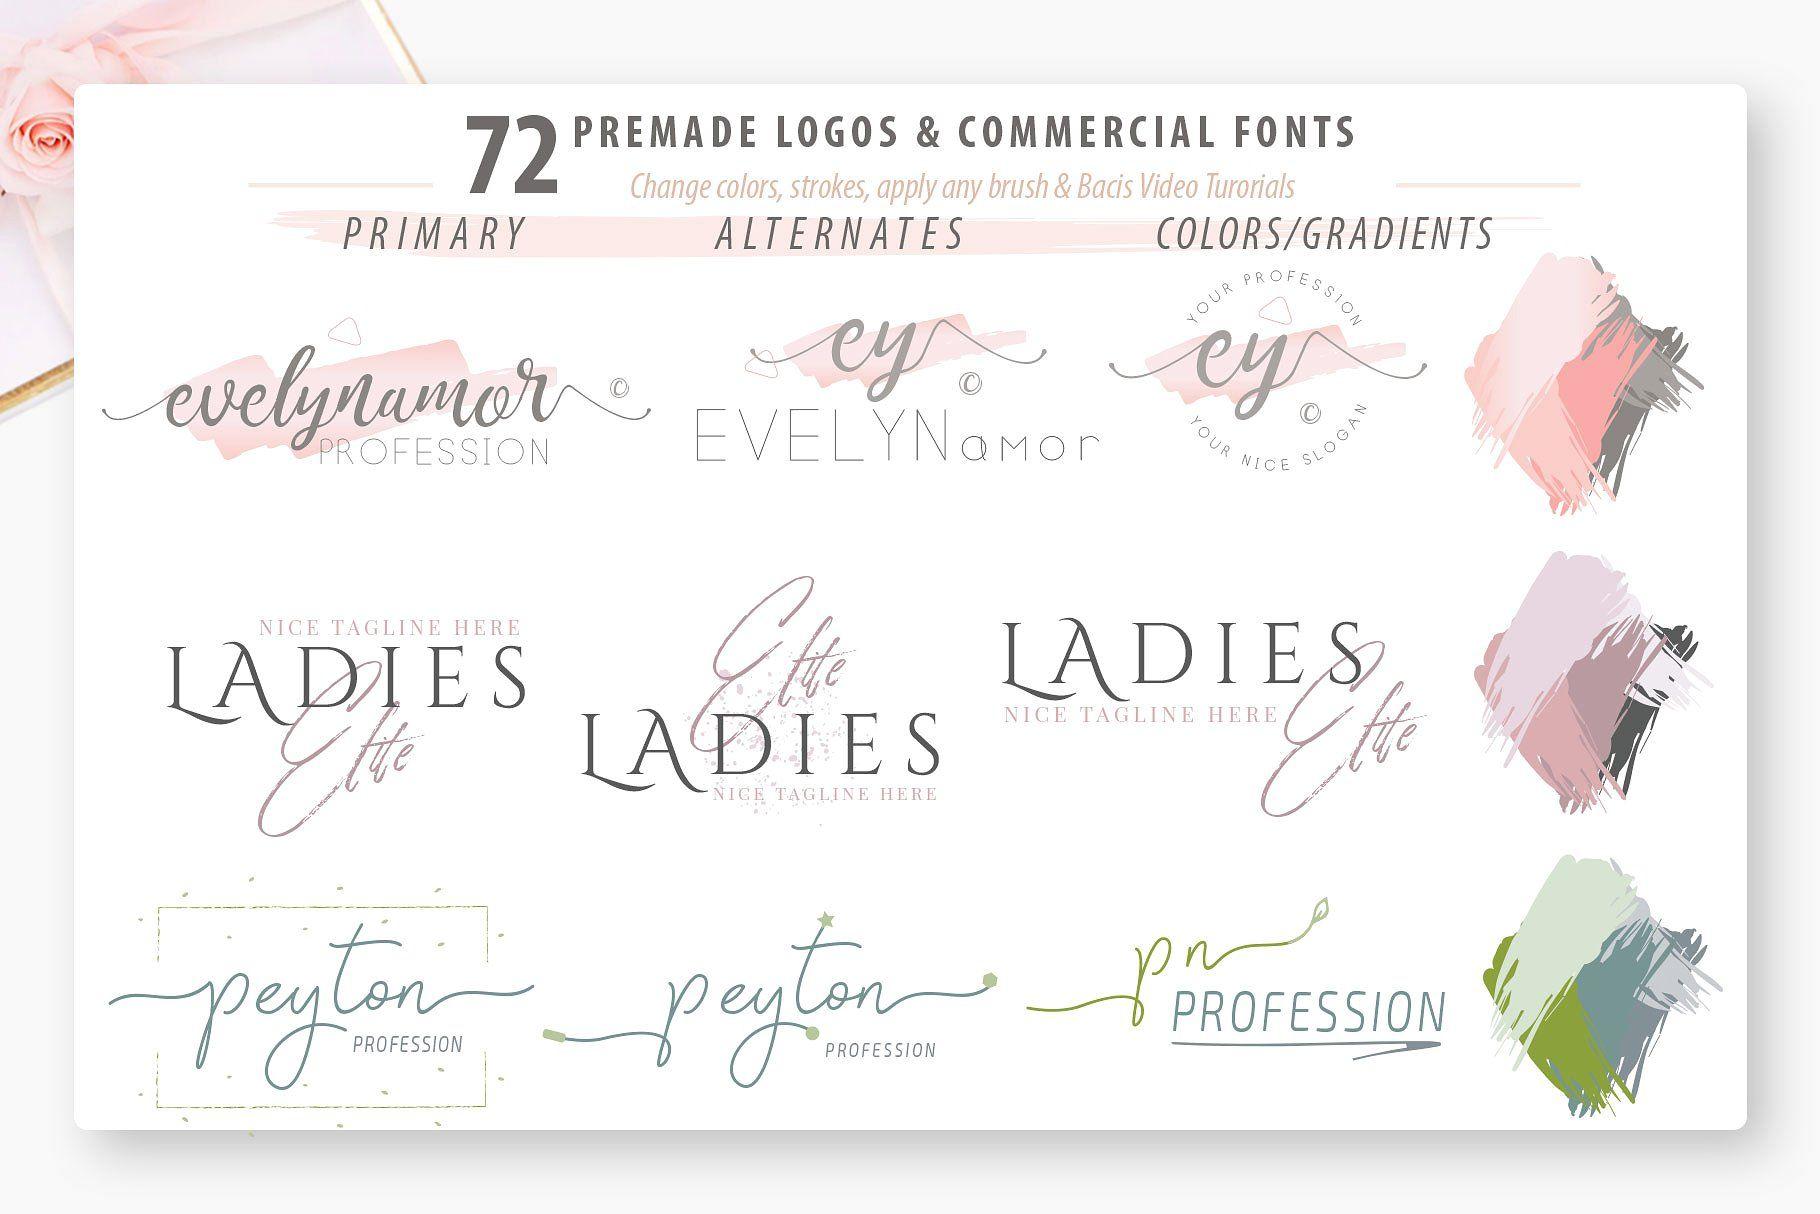 Download Ladyholic Premade Logo Branding Pack | Premade logo, Free ...